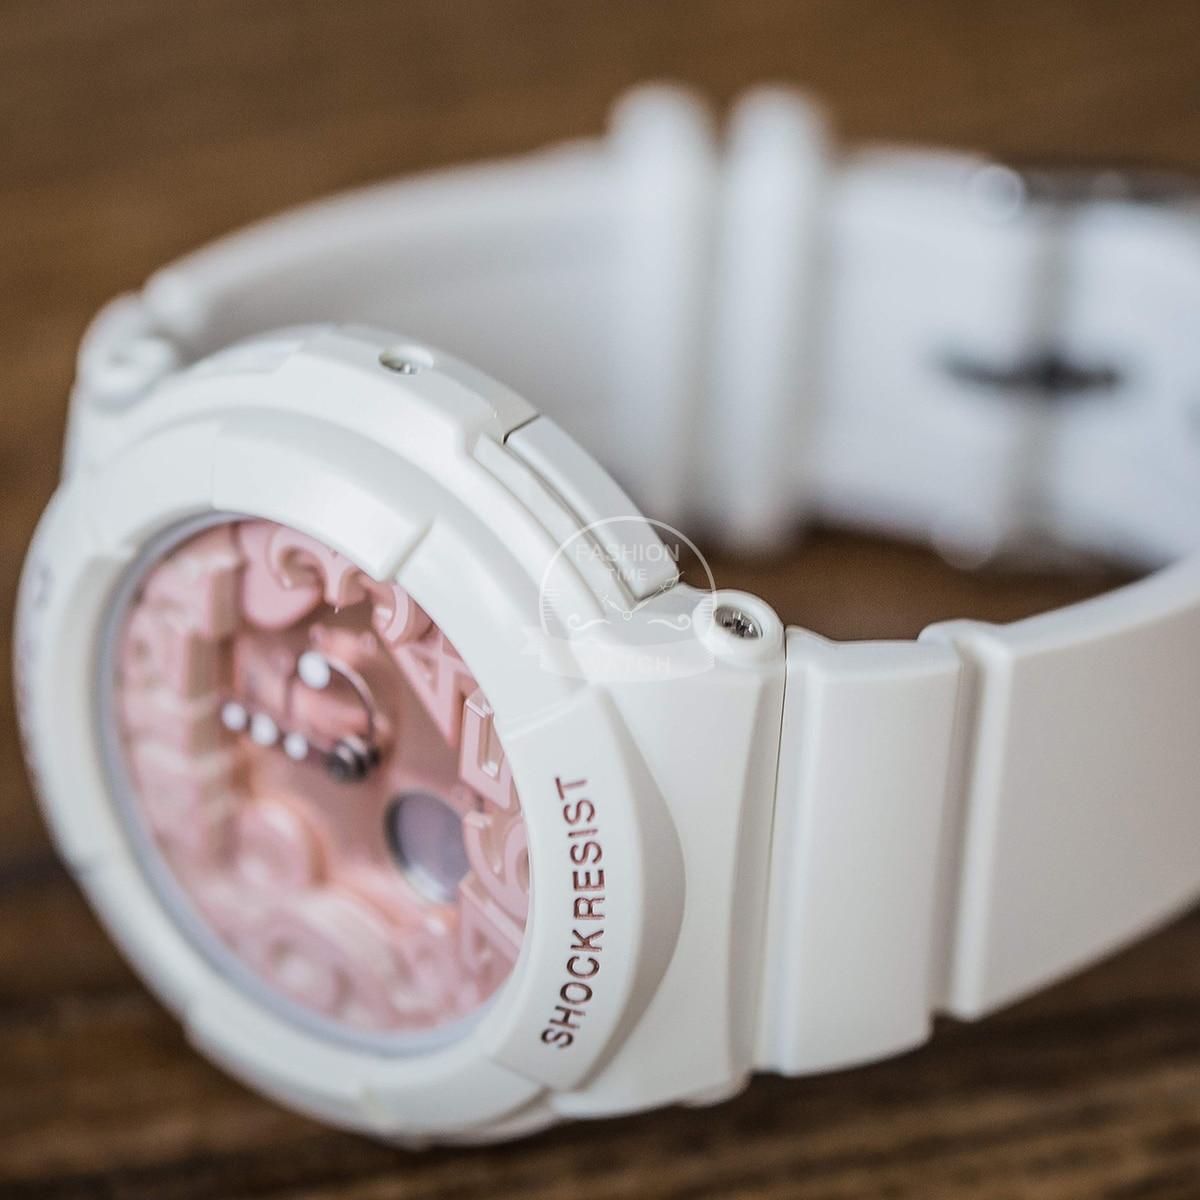 Casio watch g shock women top brand luxury Waterproof LED digital Display sport watch quartz wrist watch reloj relogio BGA-131 enlarge